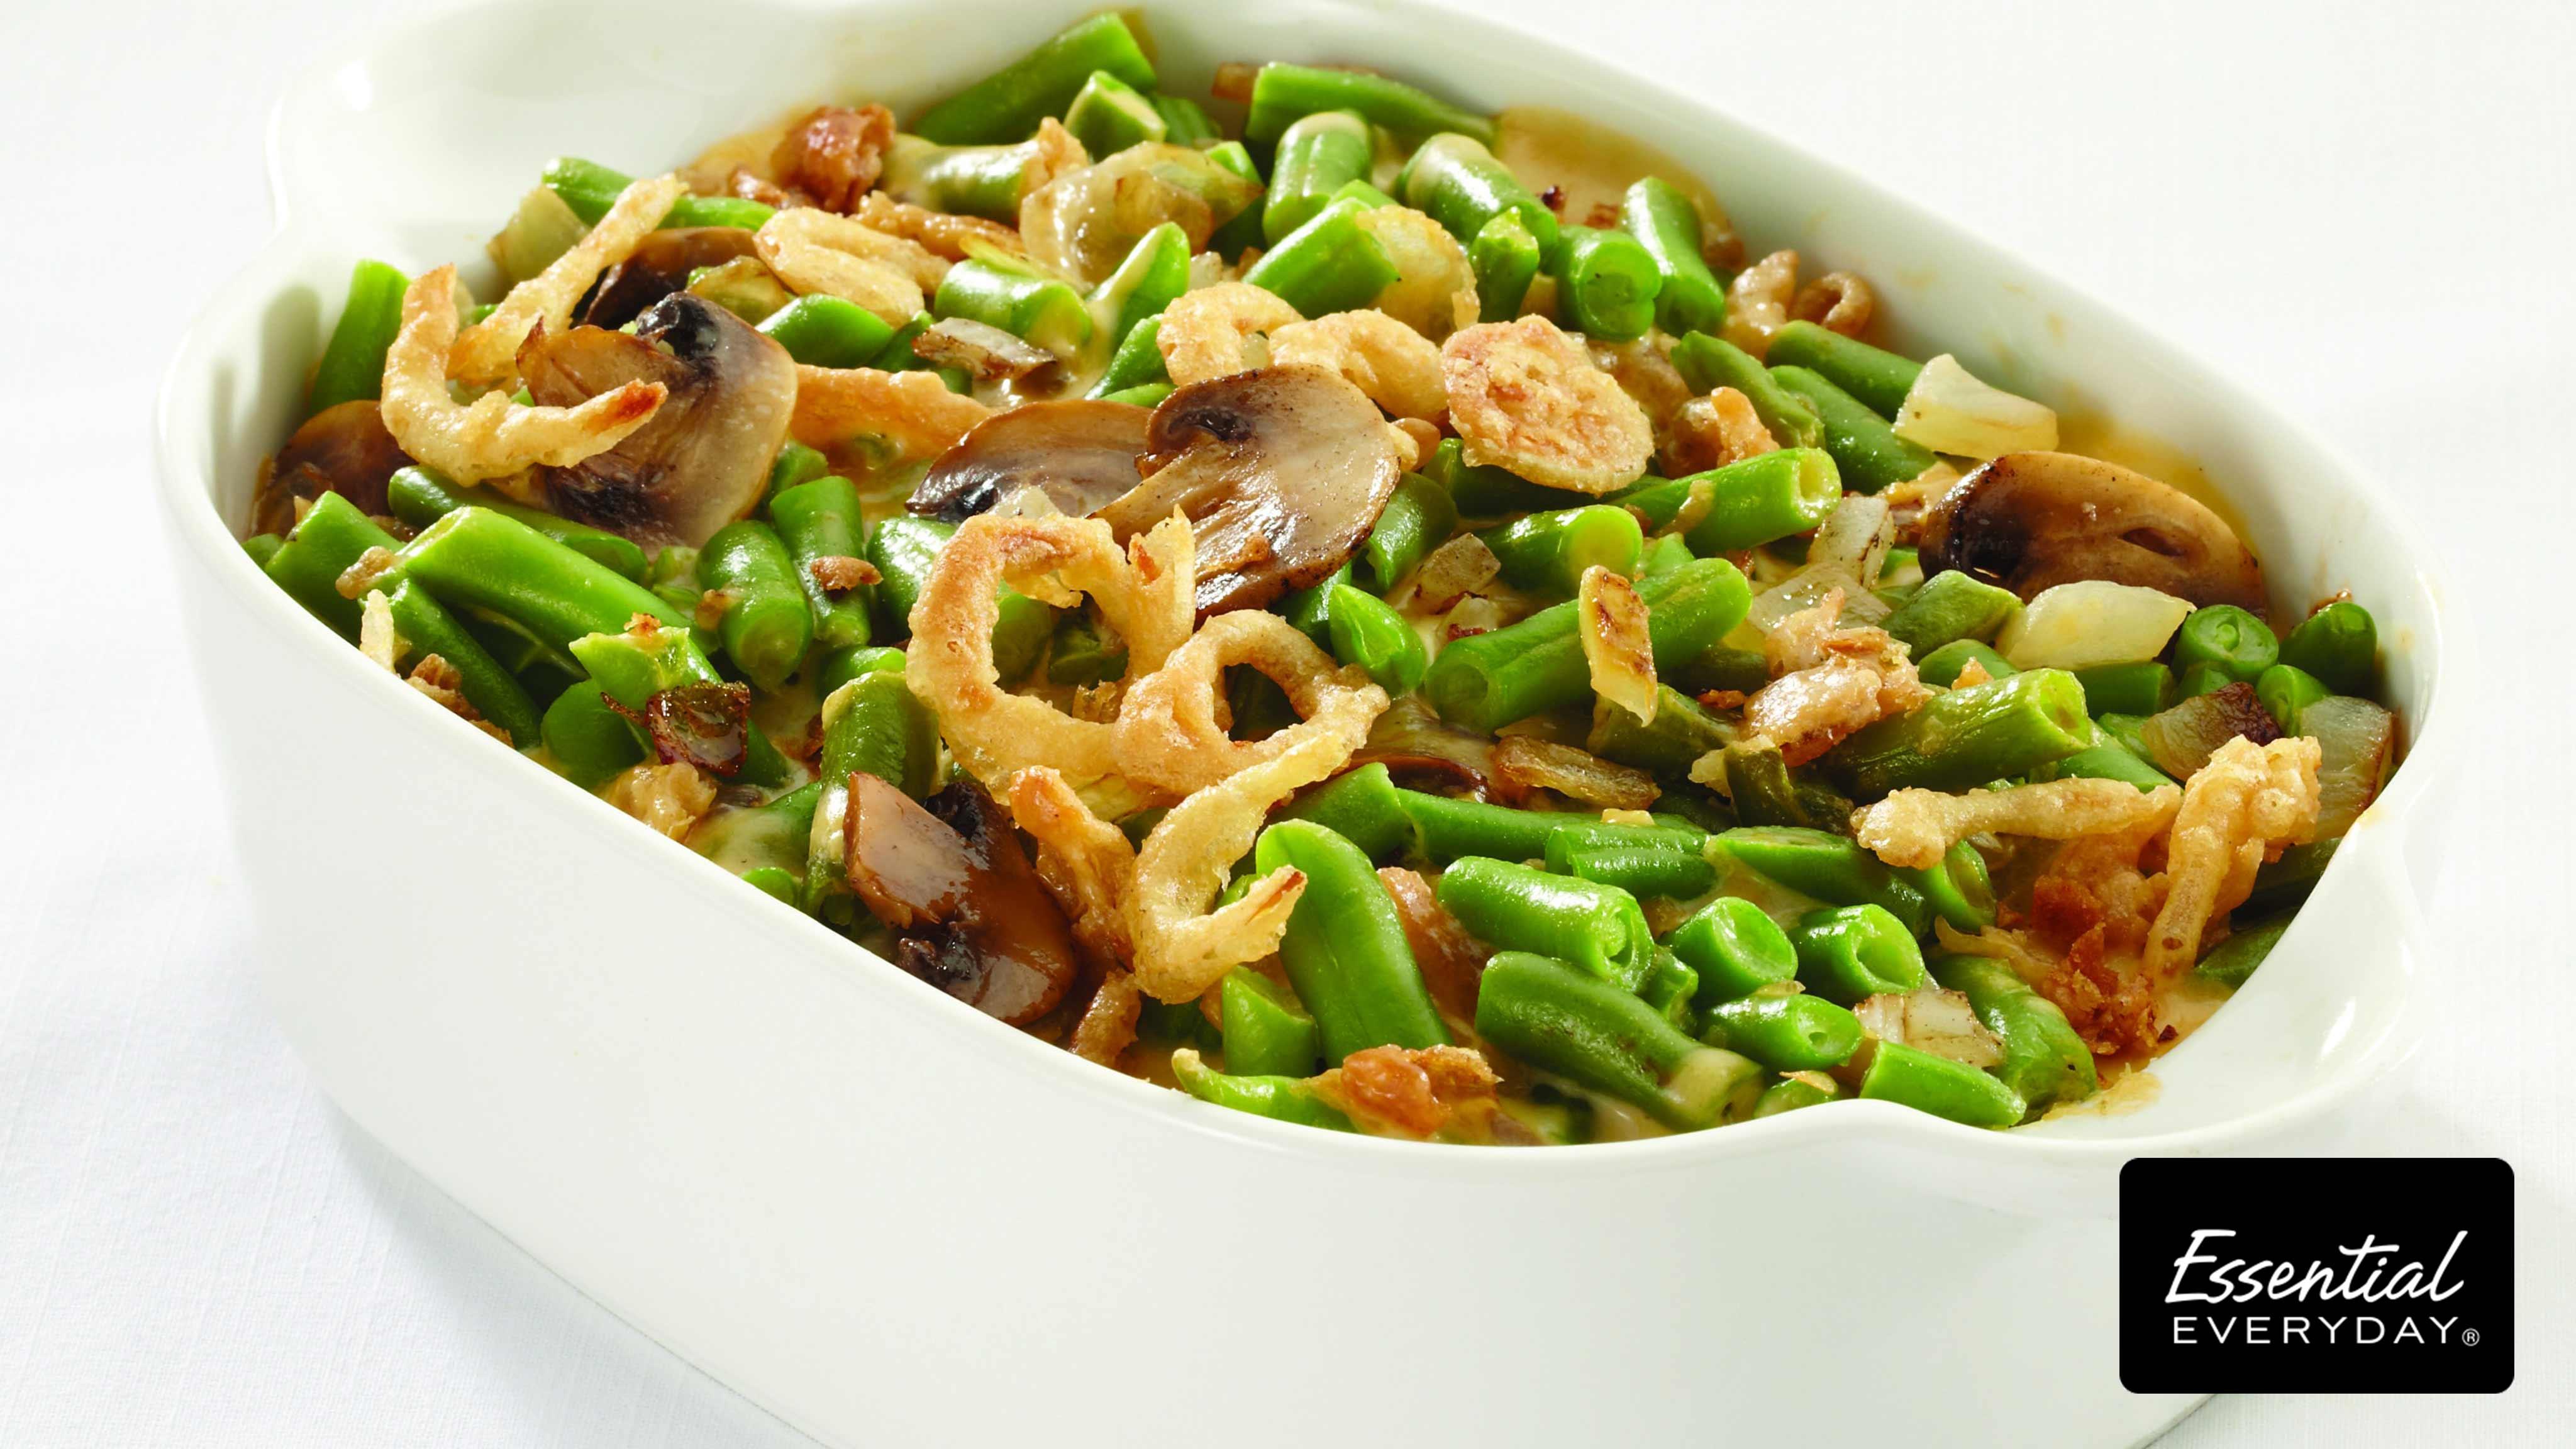 Image for Recipe Cheesy Green Bean Casserole